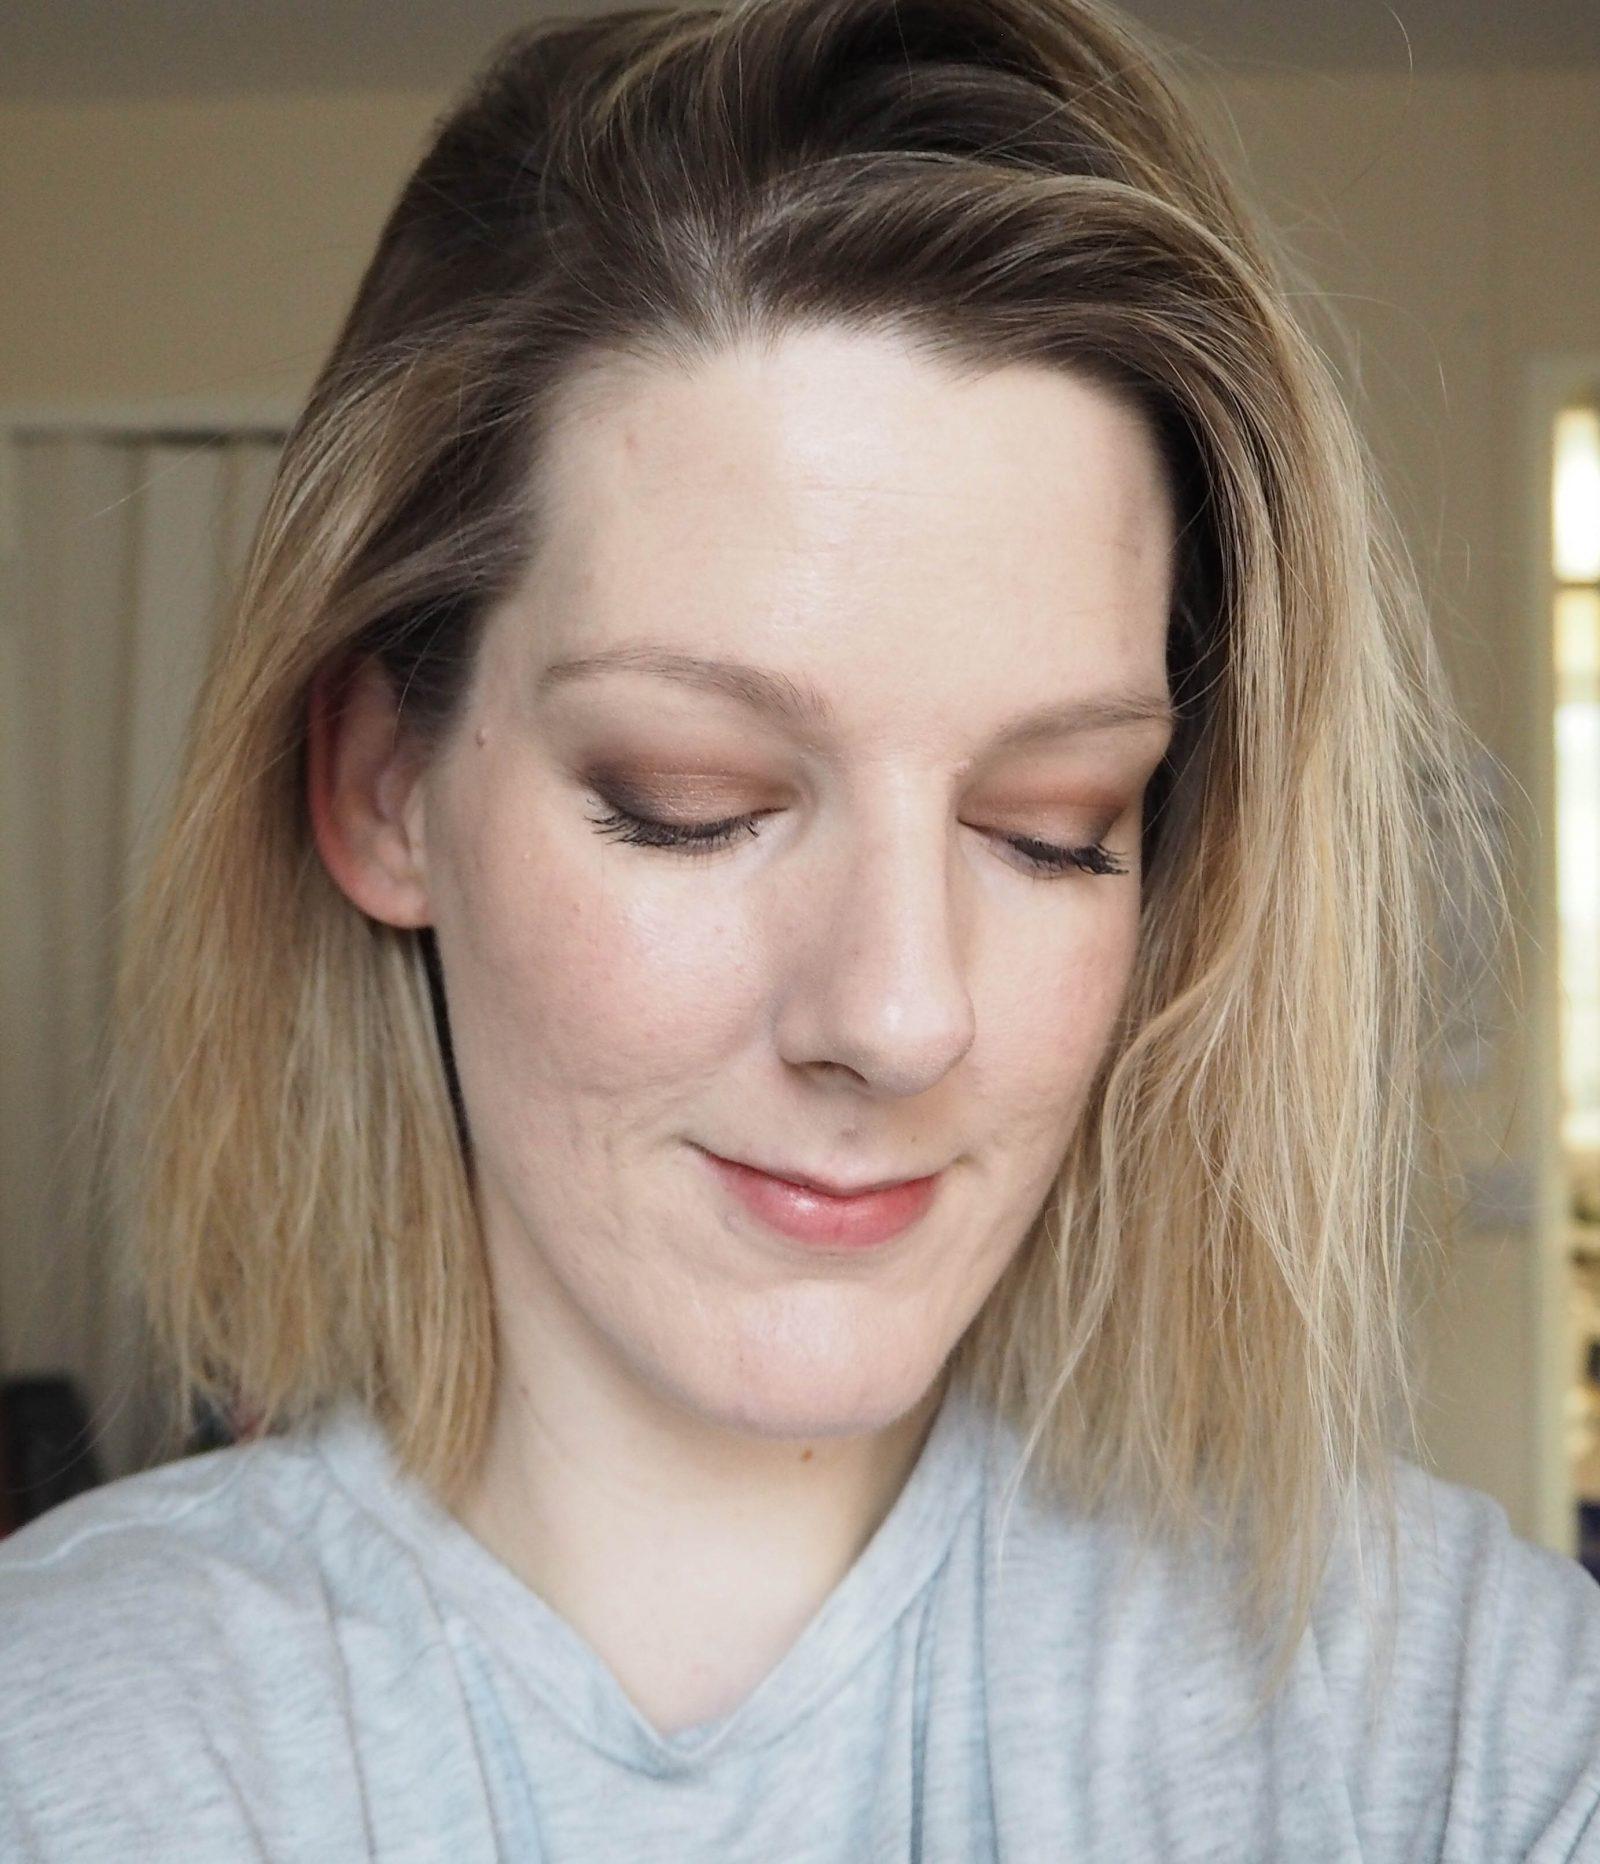 Makeup Revolution Pro HD Palette Amplified 35 in Socialite